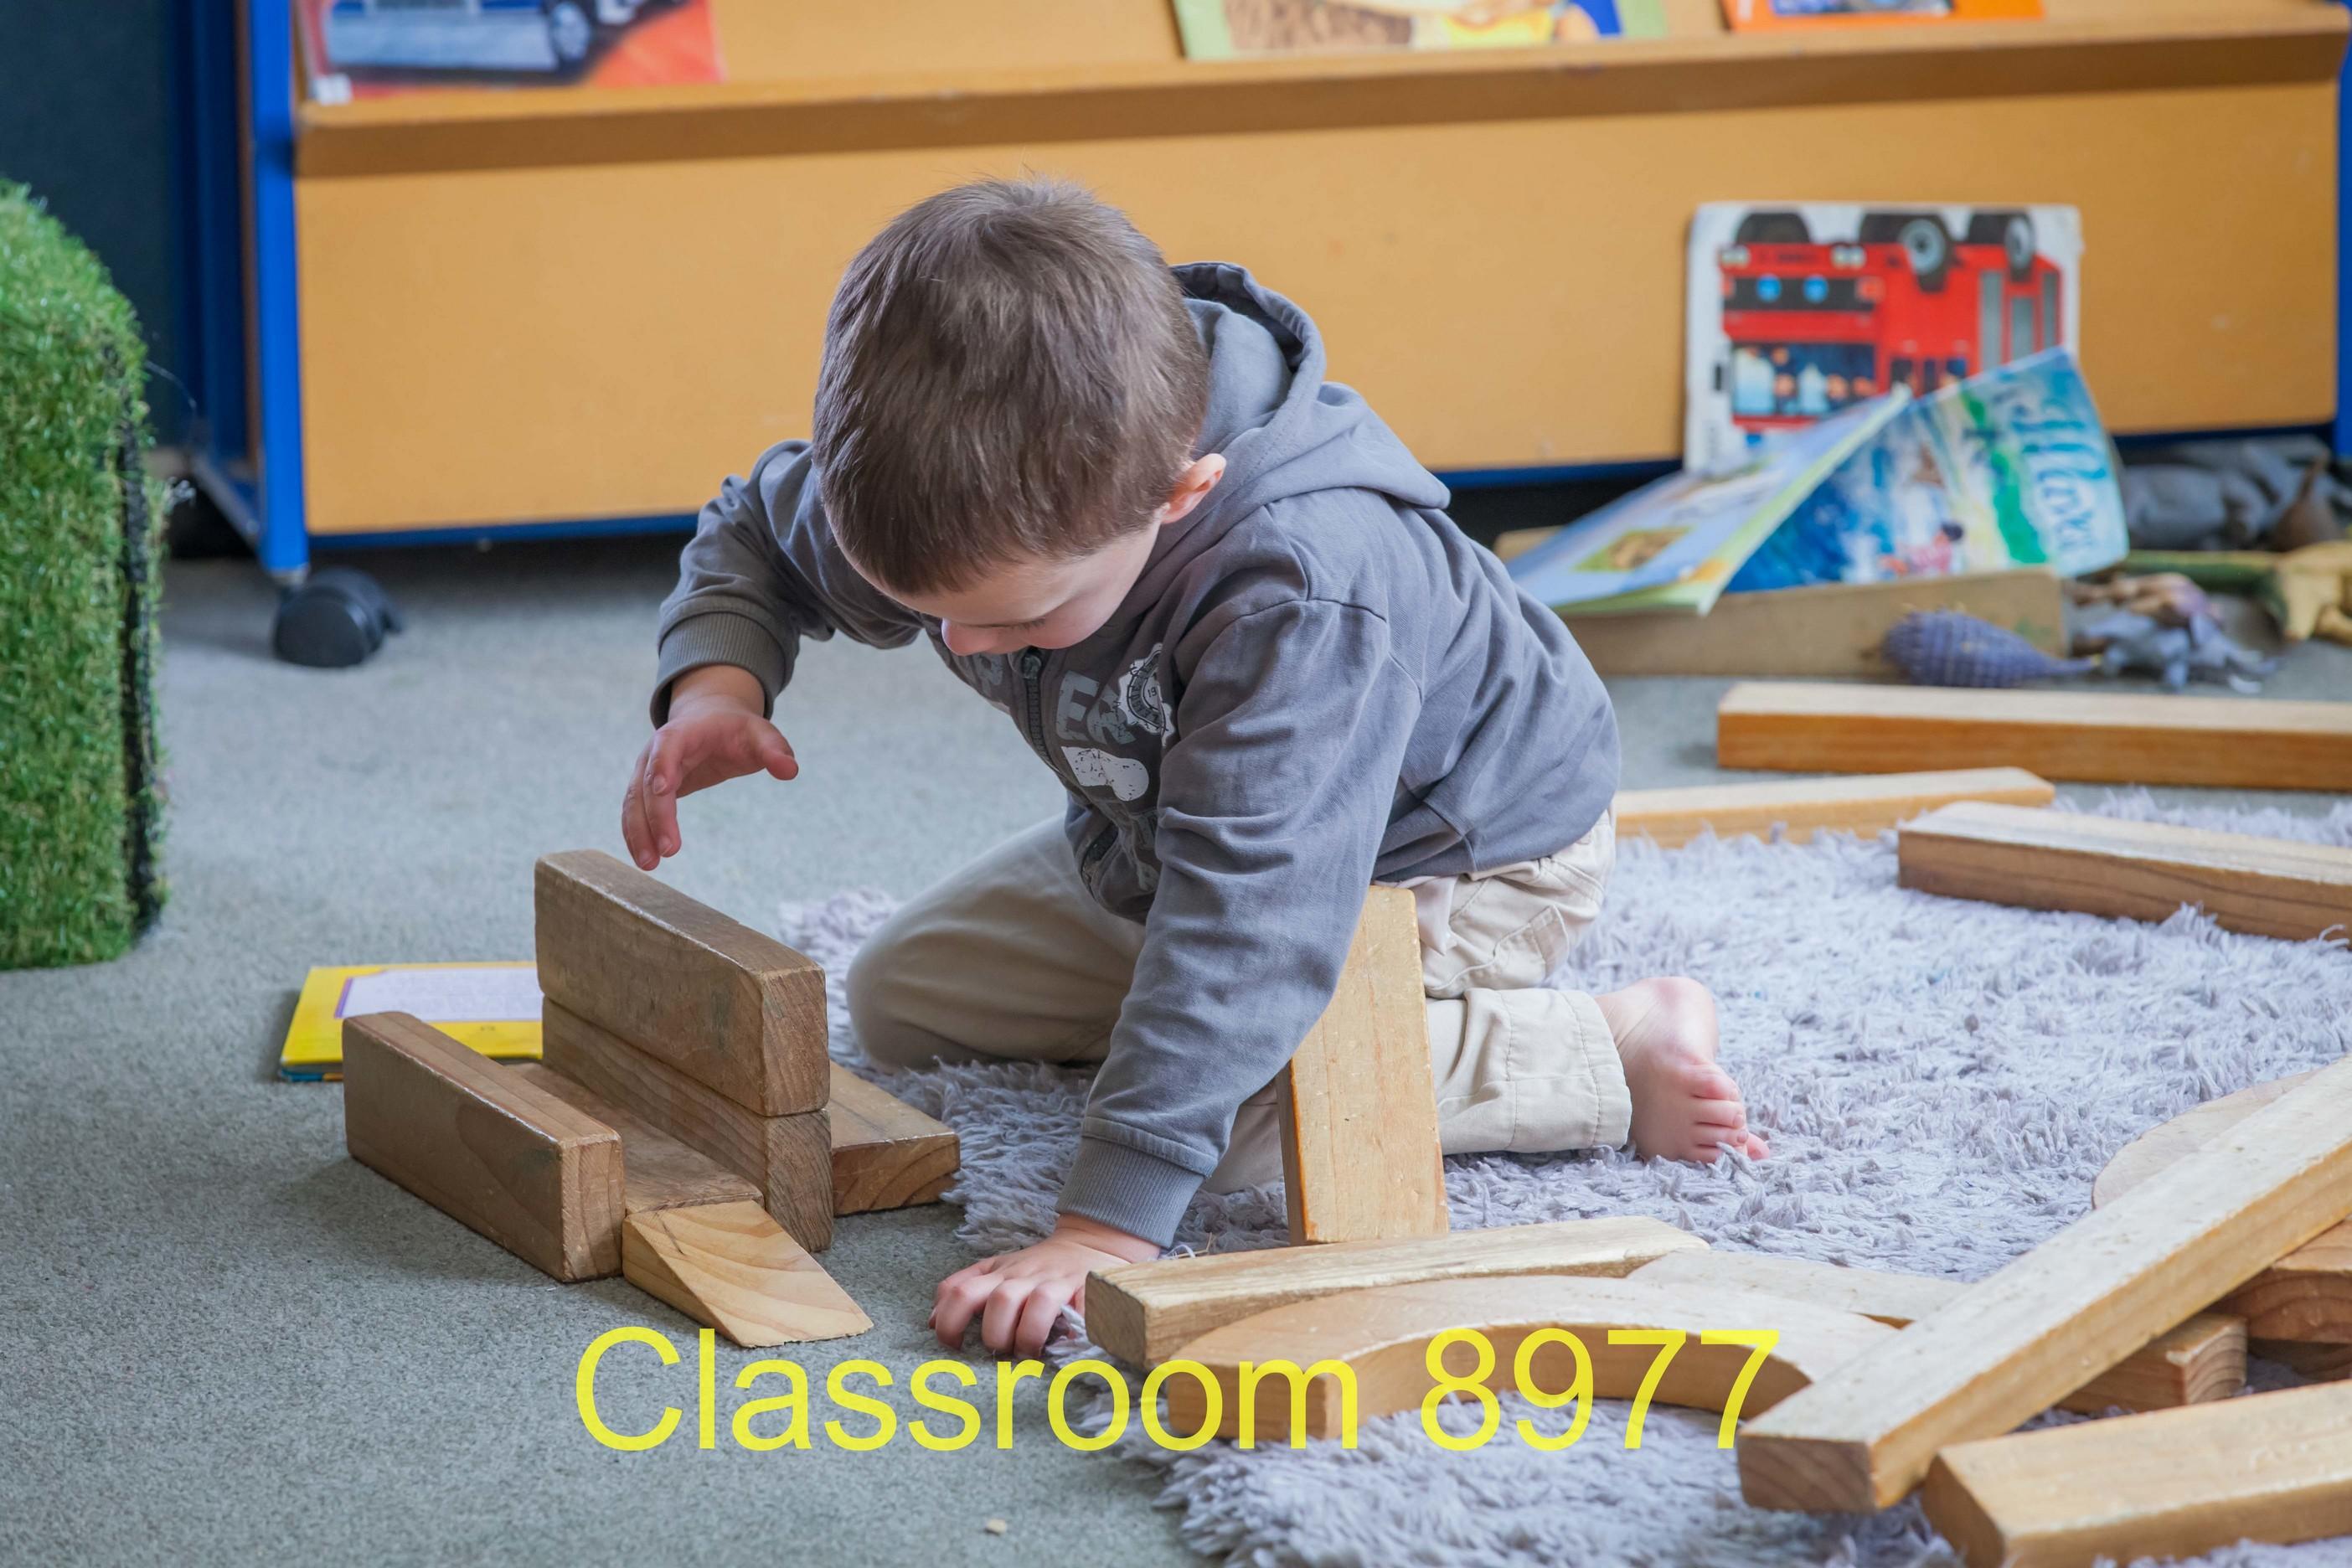 Classroom 8977